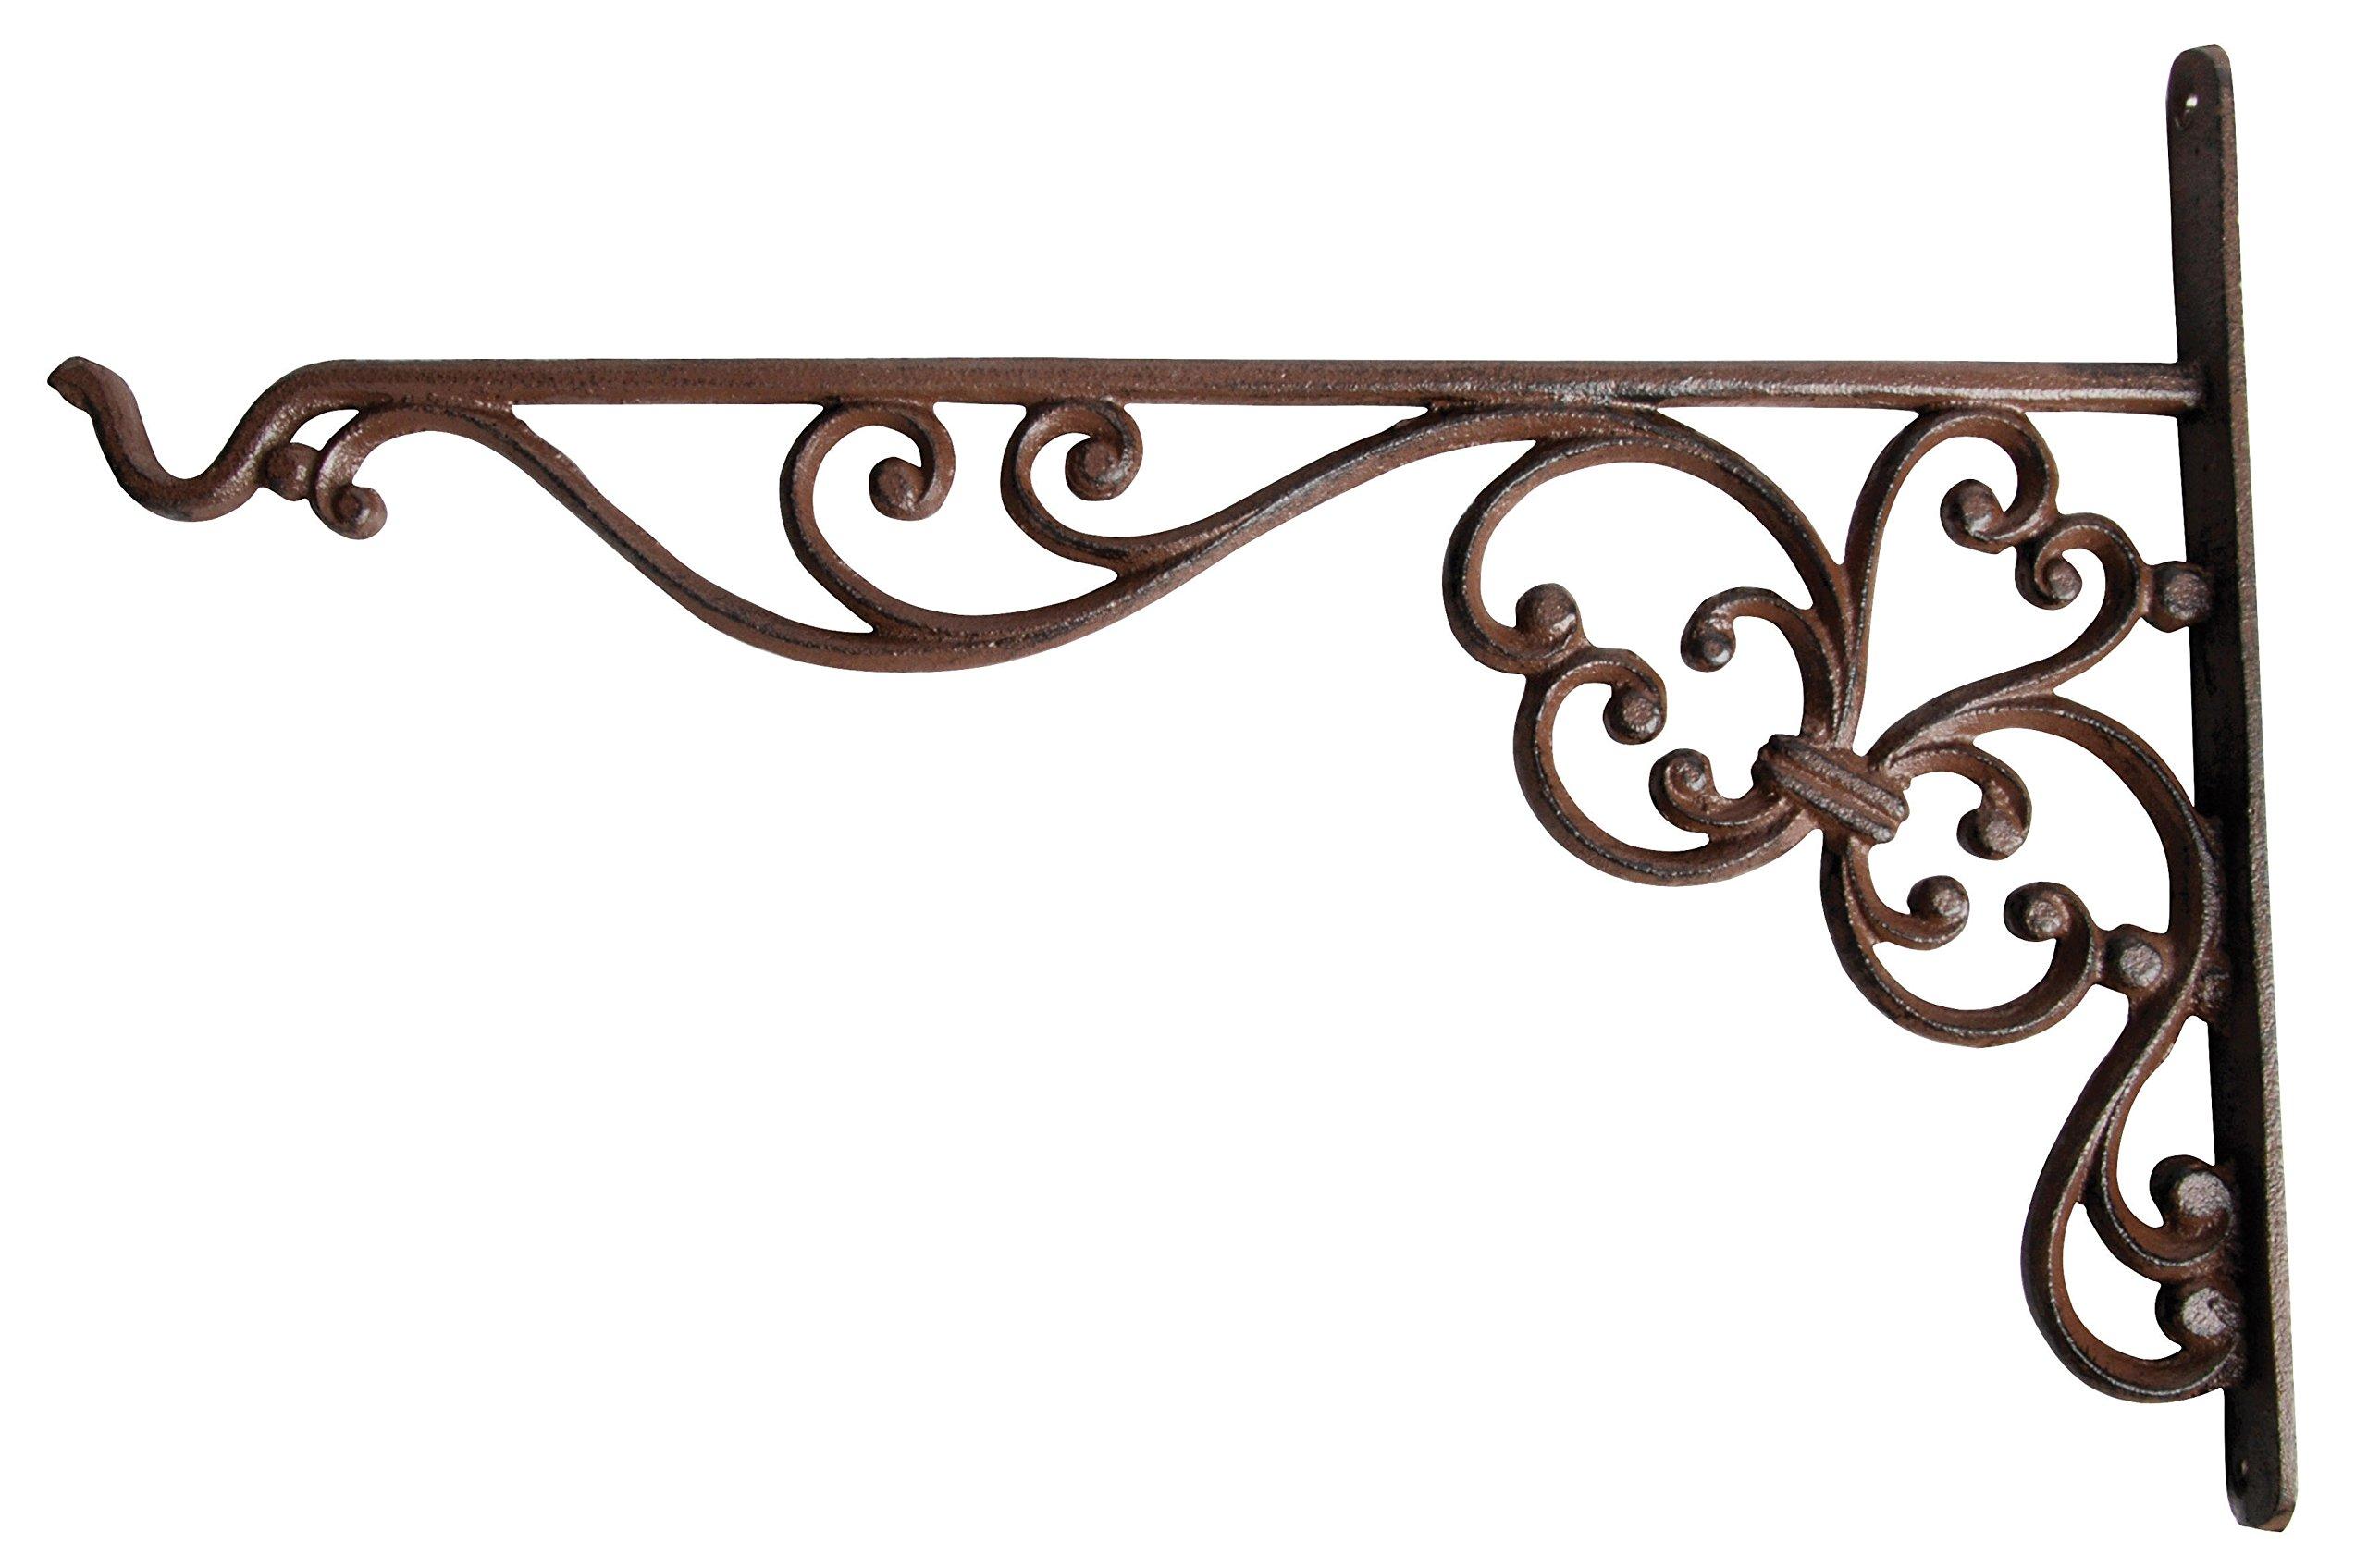 Esschert Design Cast Iron Basket Hanger by Esschert Design